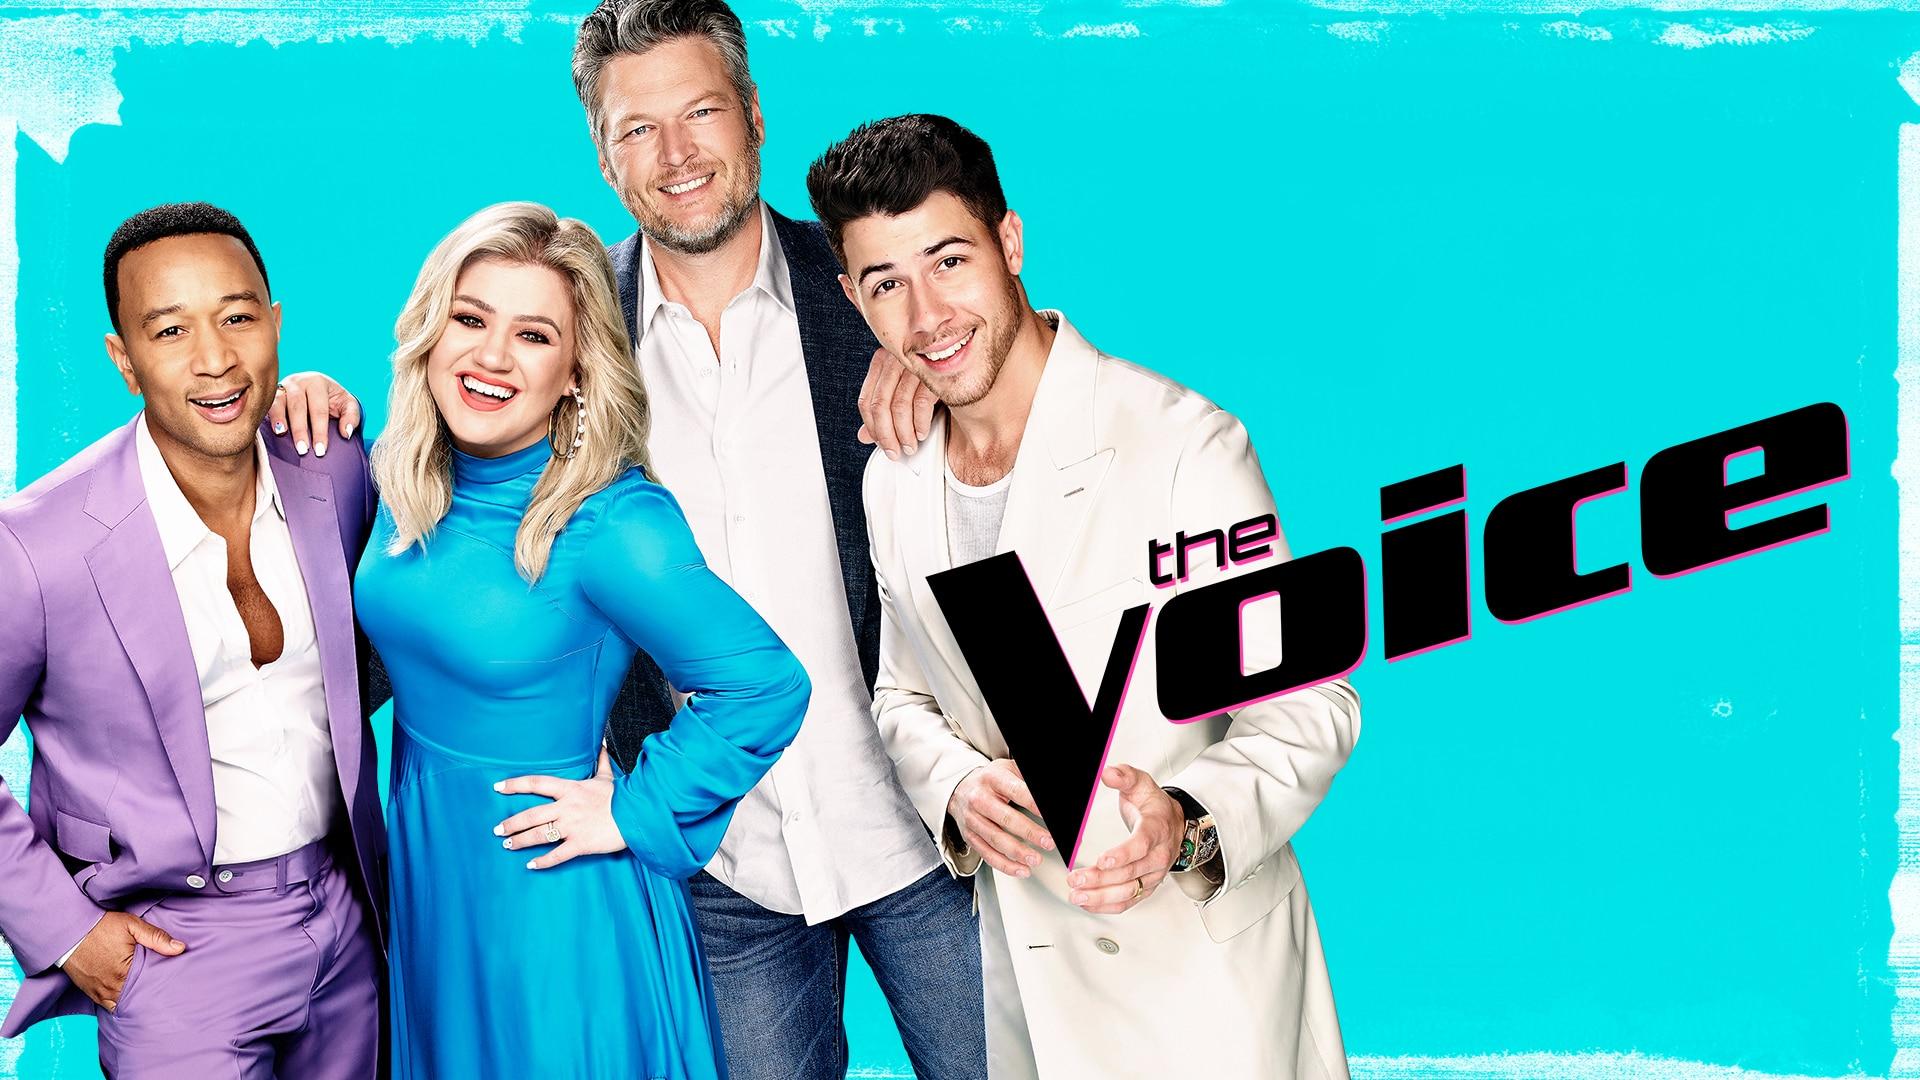 The Voice Season 18 Episodes at NBC.com